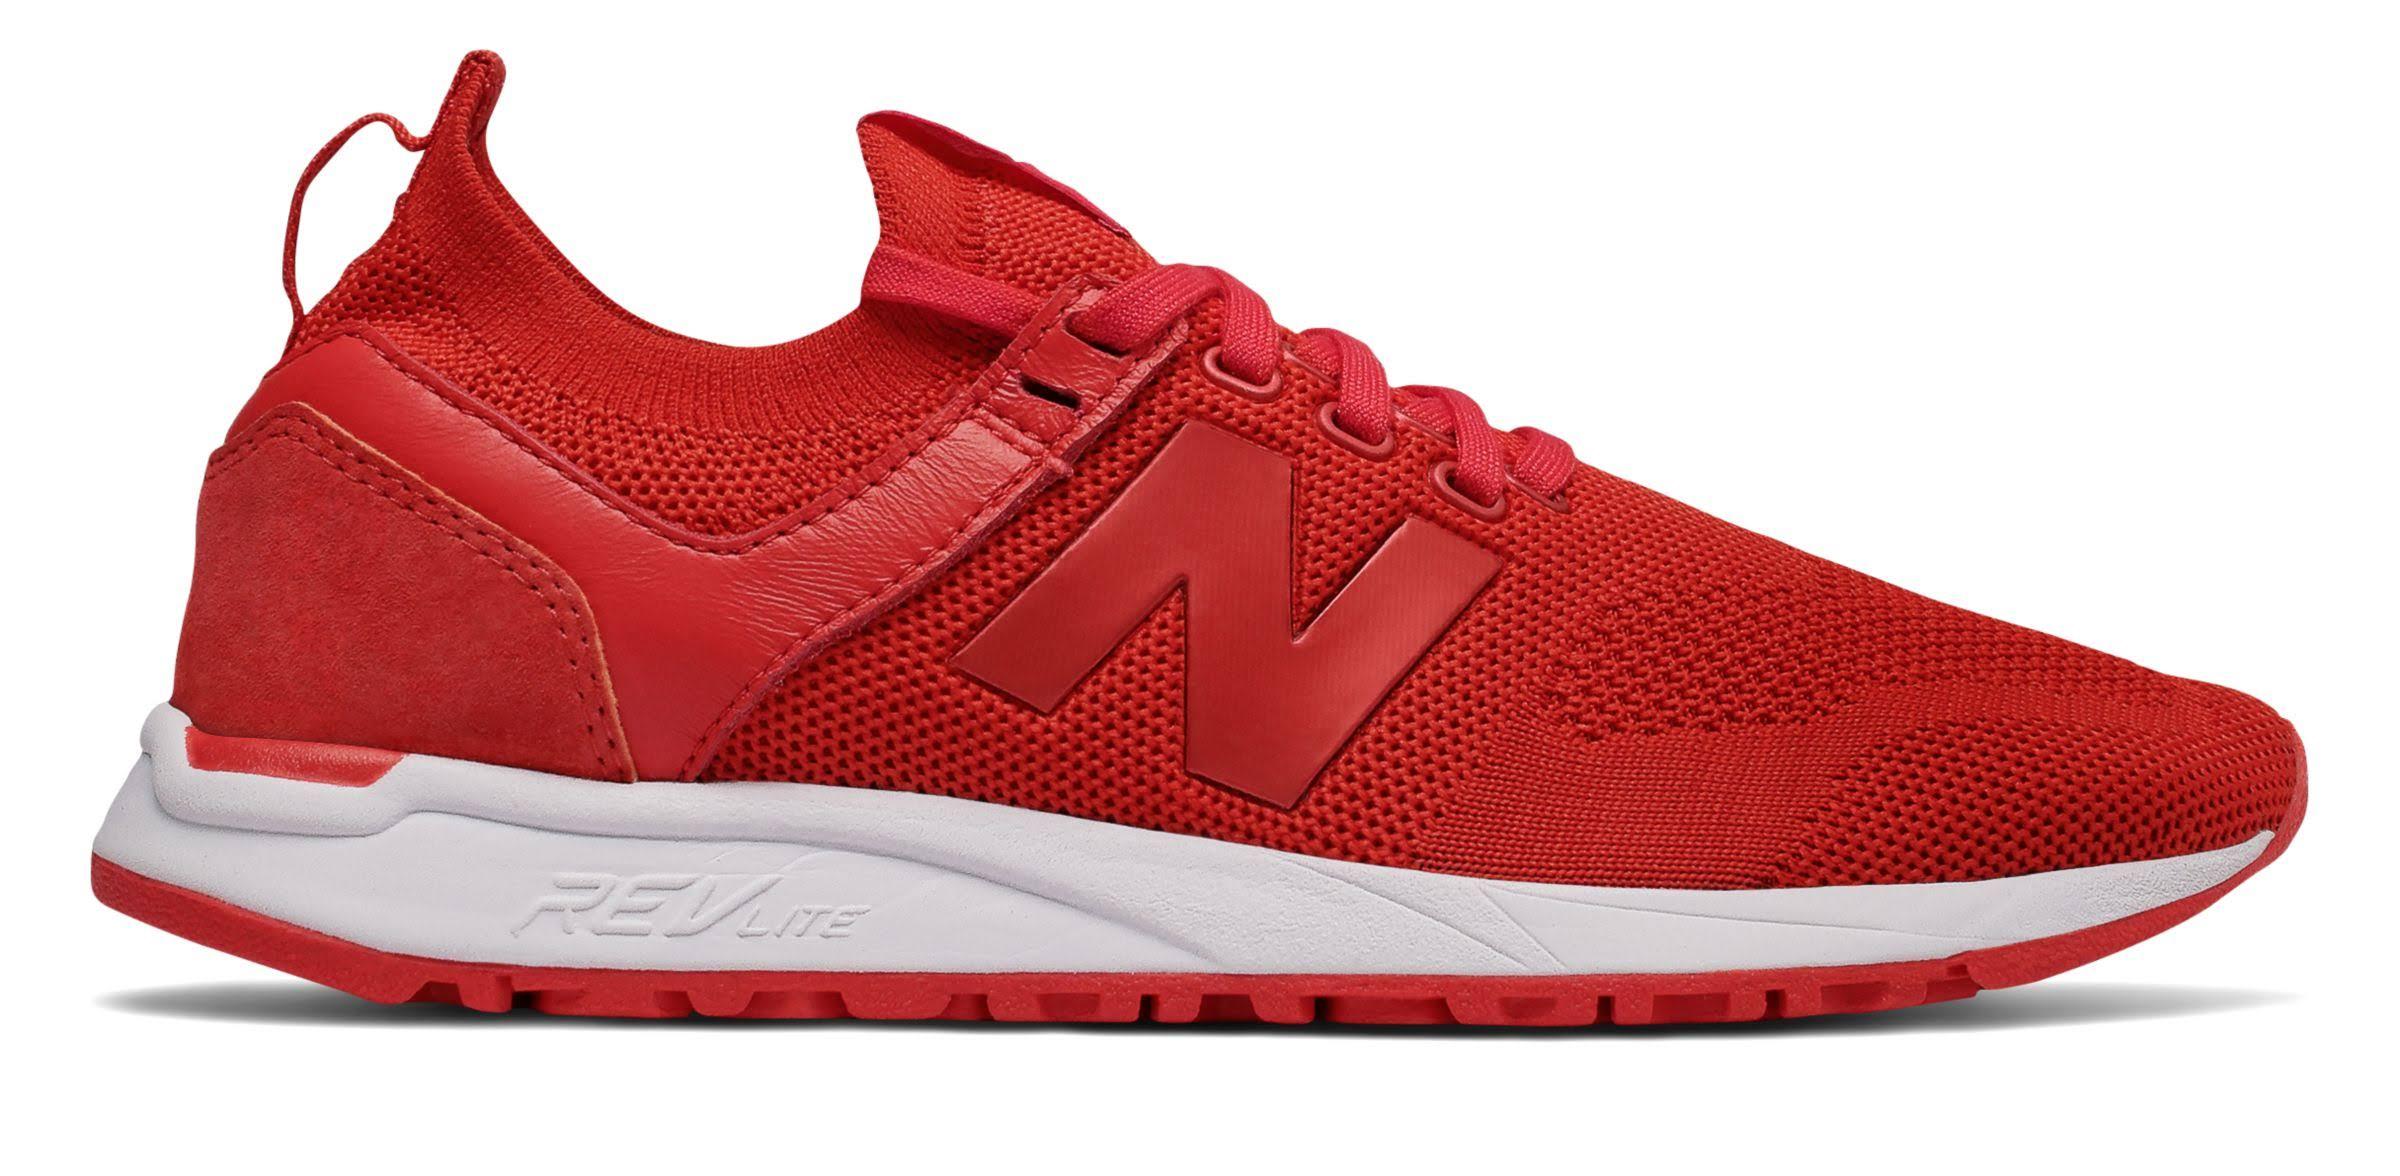 5 Sneakermaat Mesh Brood New Engineered Dames 247 Balance XuPkiOZ